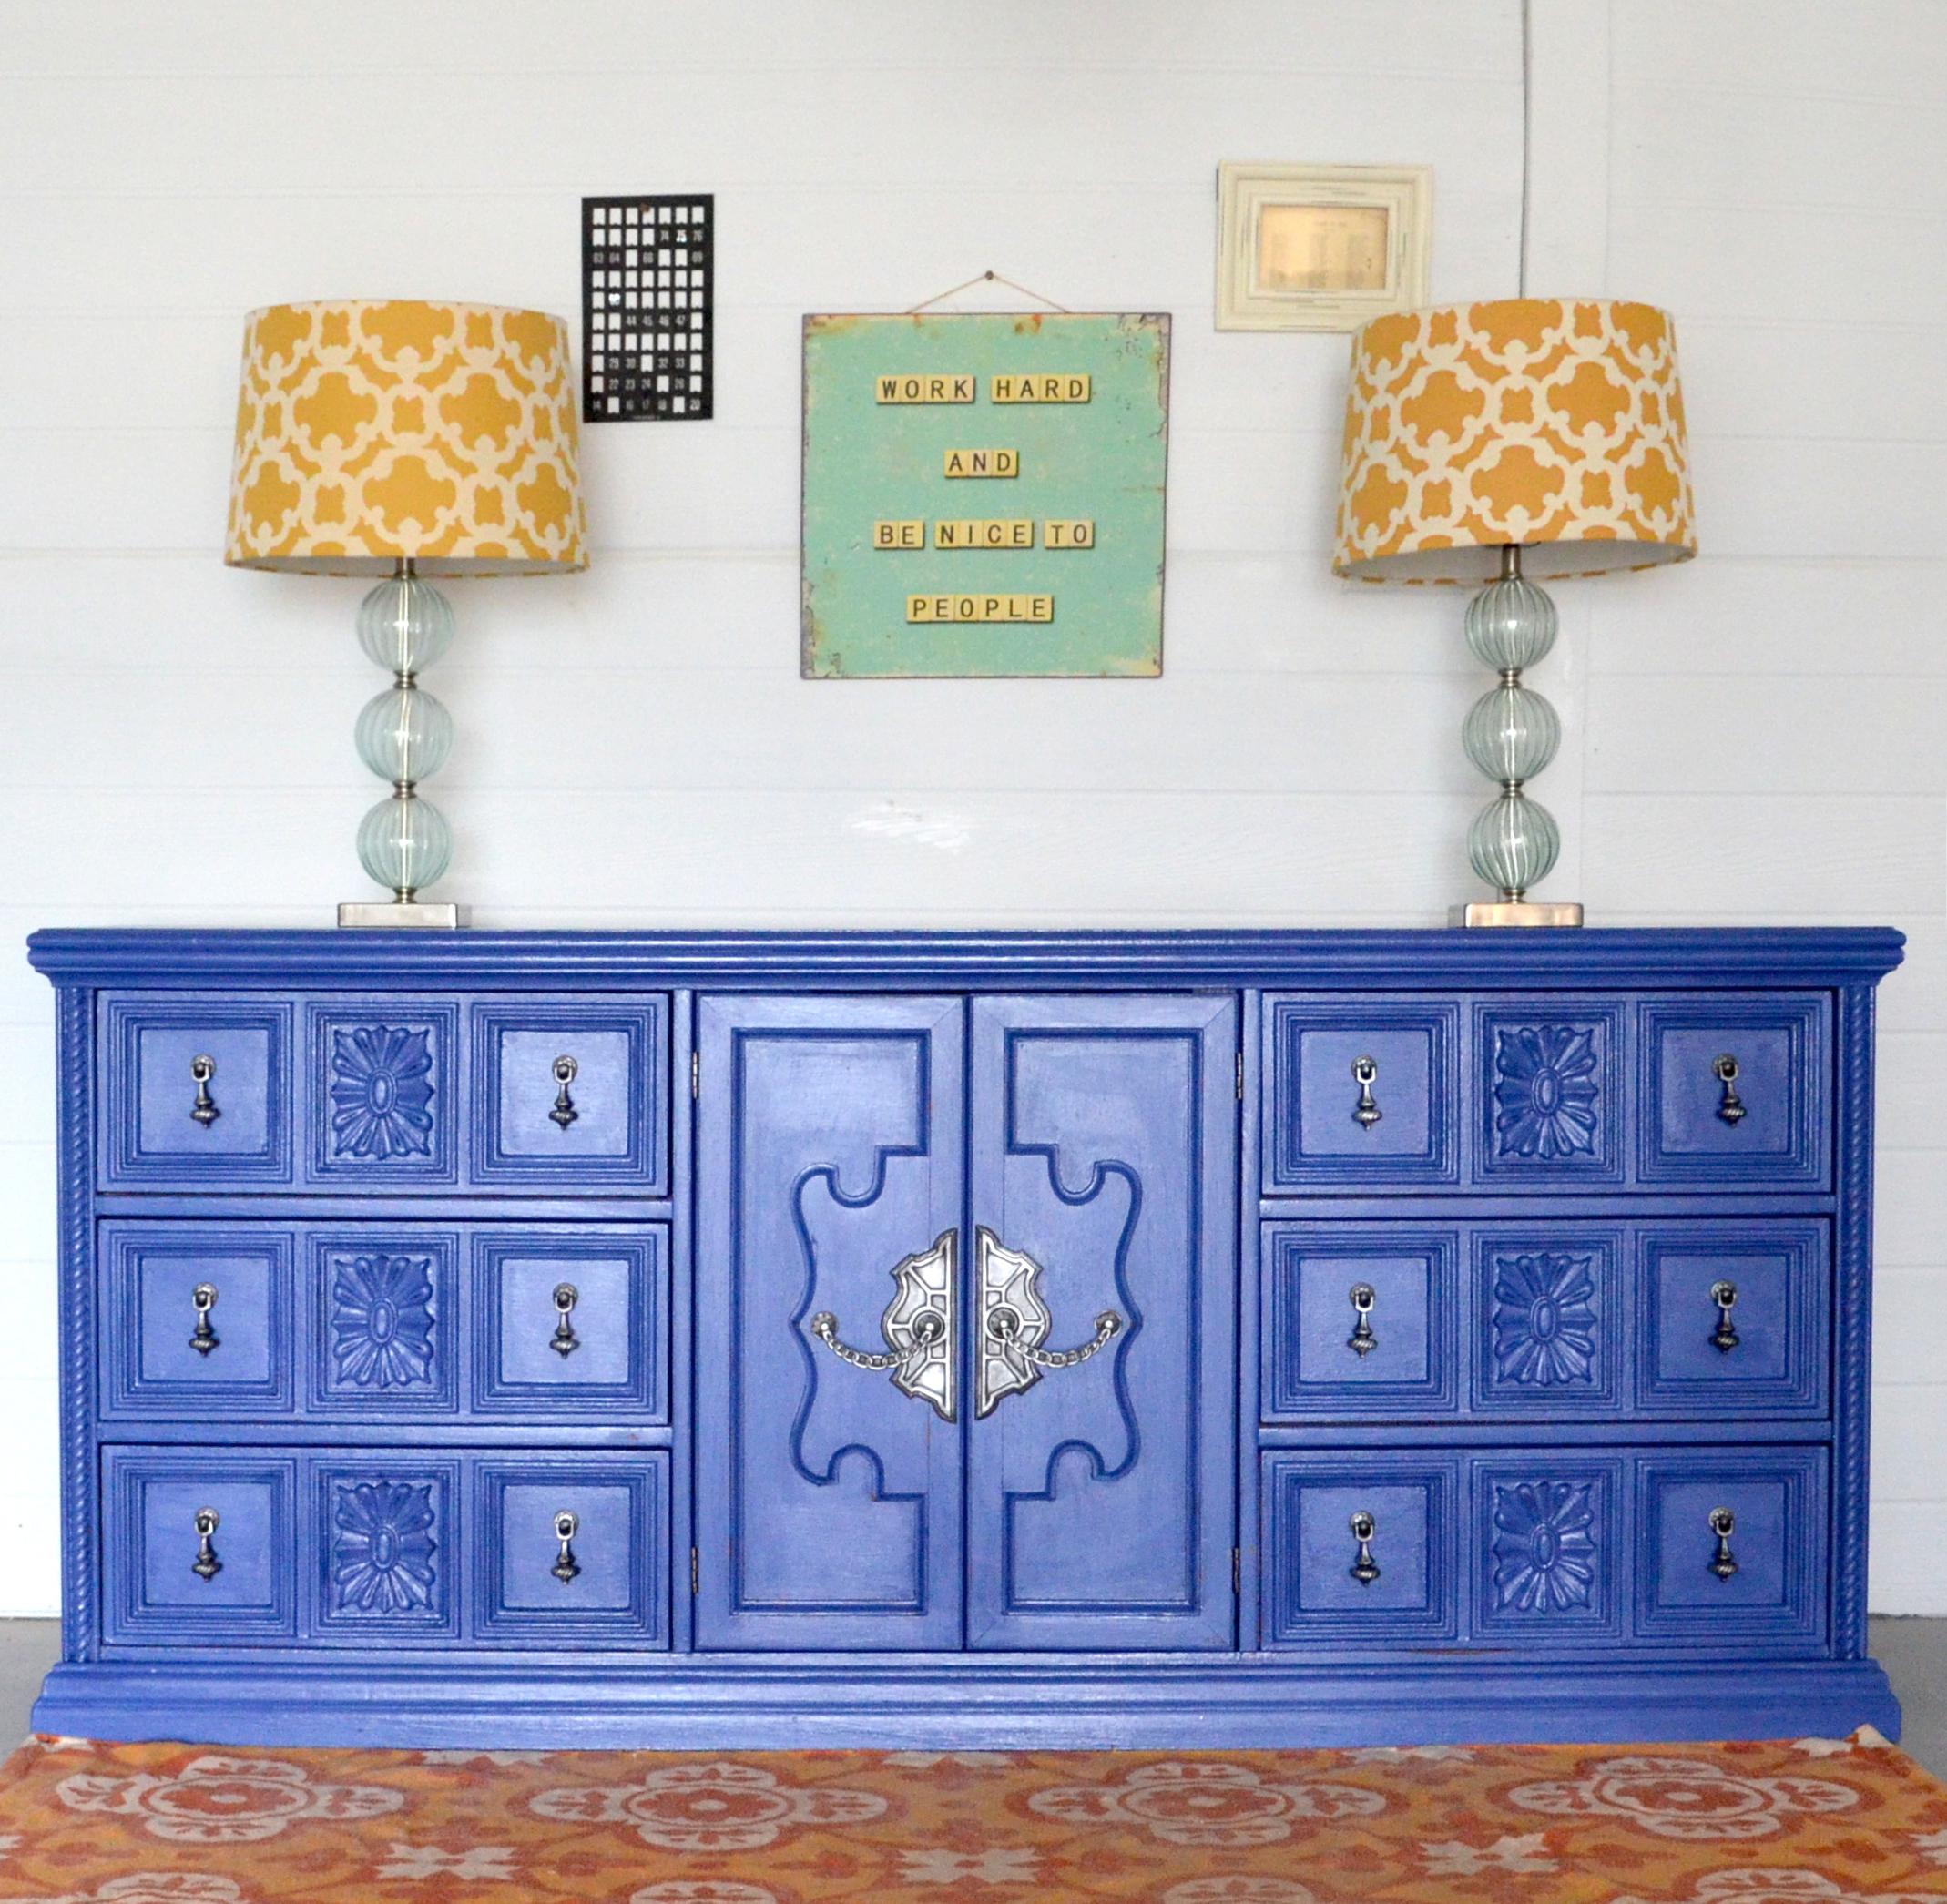 CeCe Caldwell Maine Harbor Blue Dresser 1